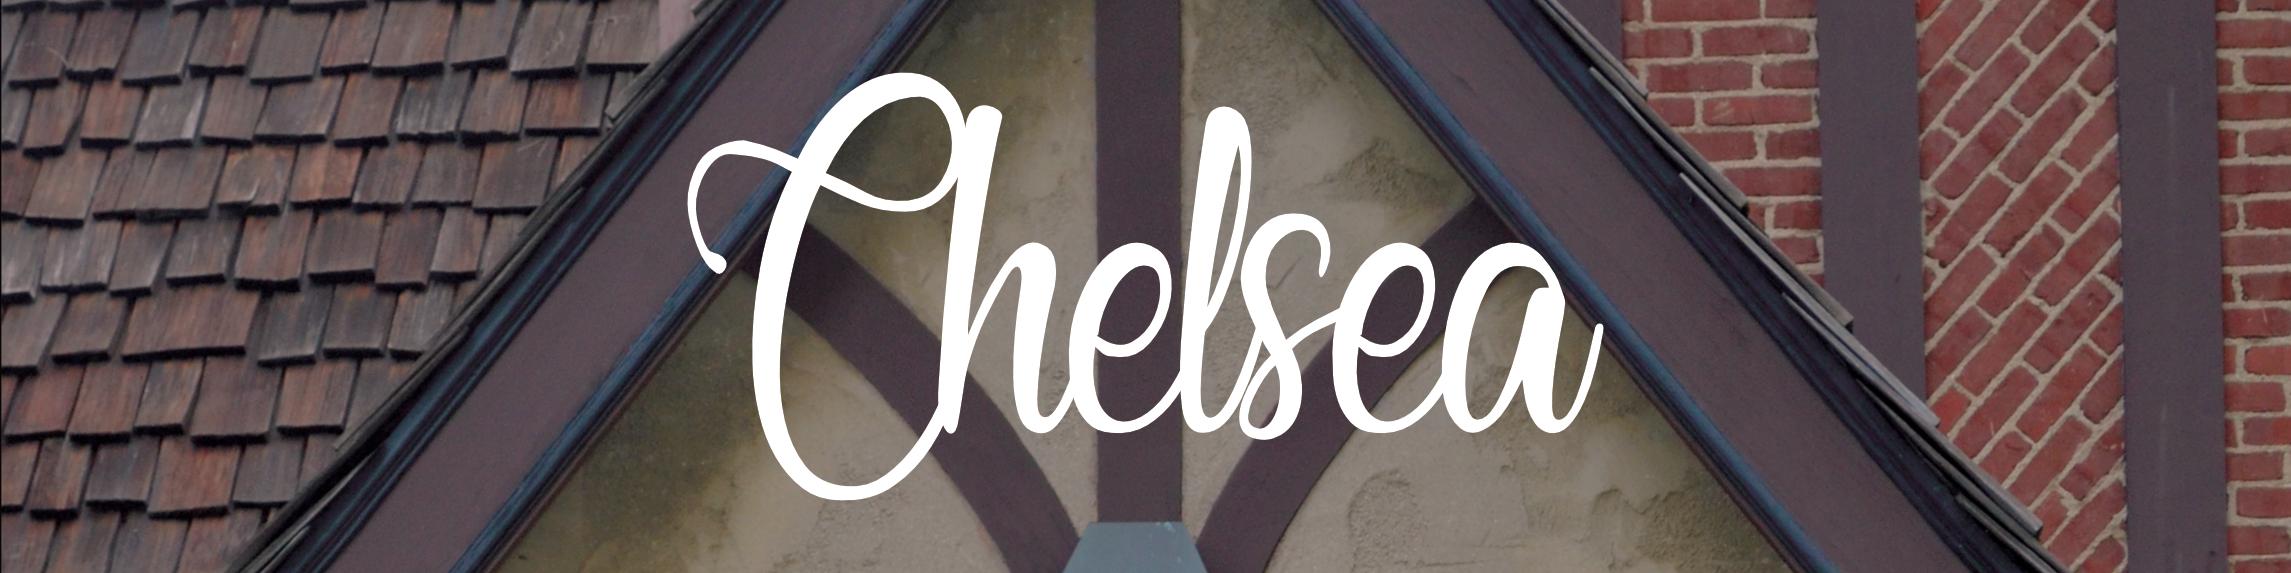 Luxury homes for sale in Chelsea al